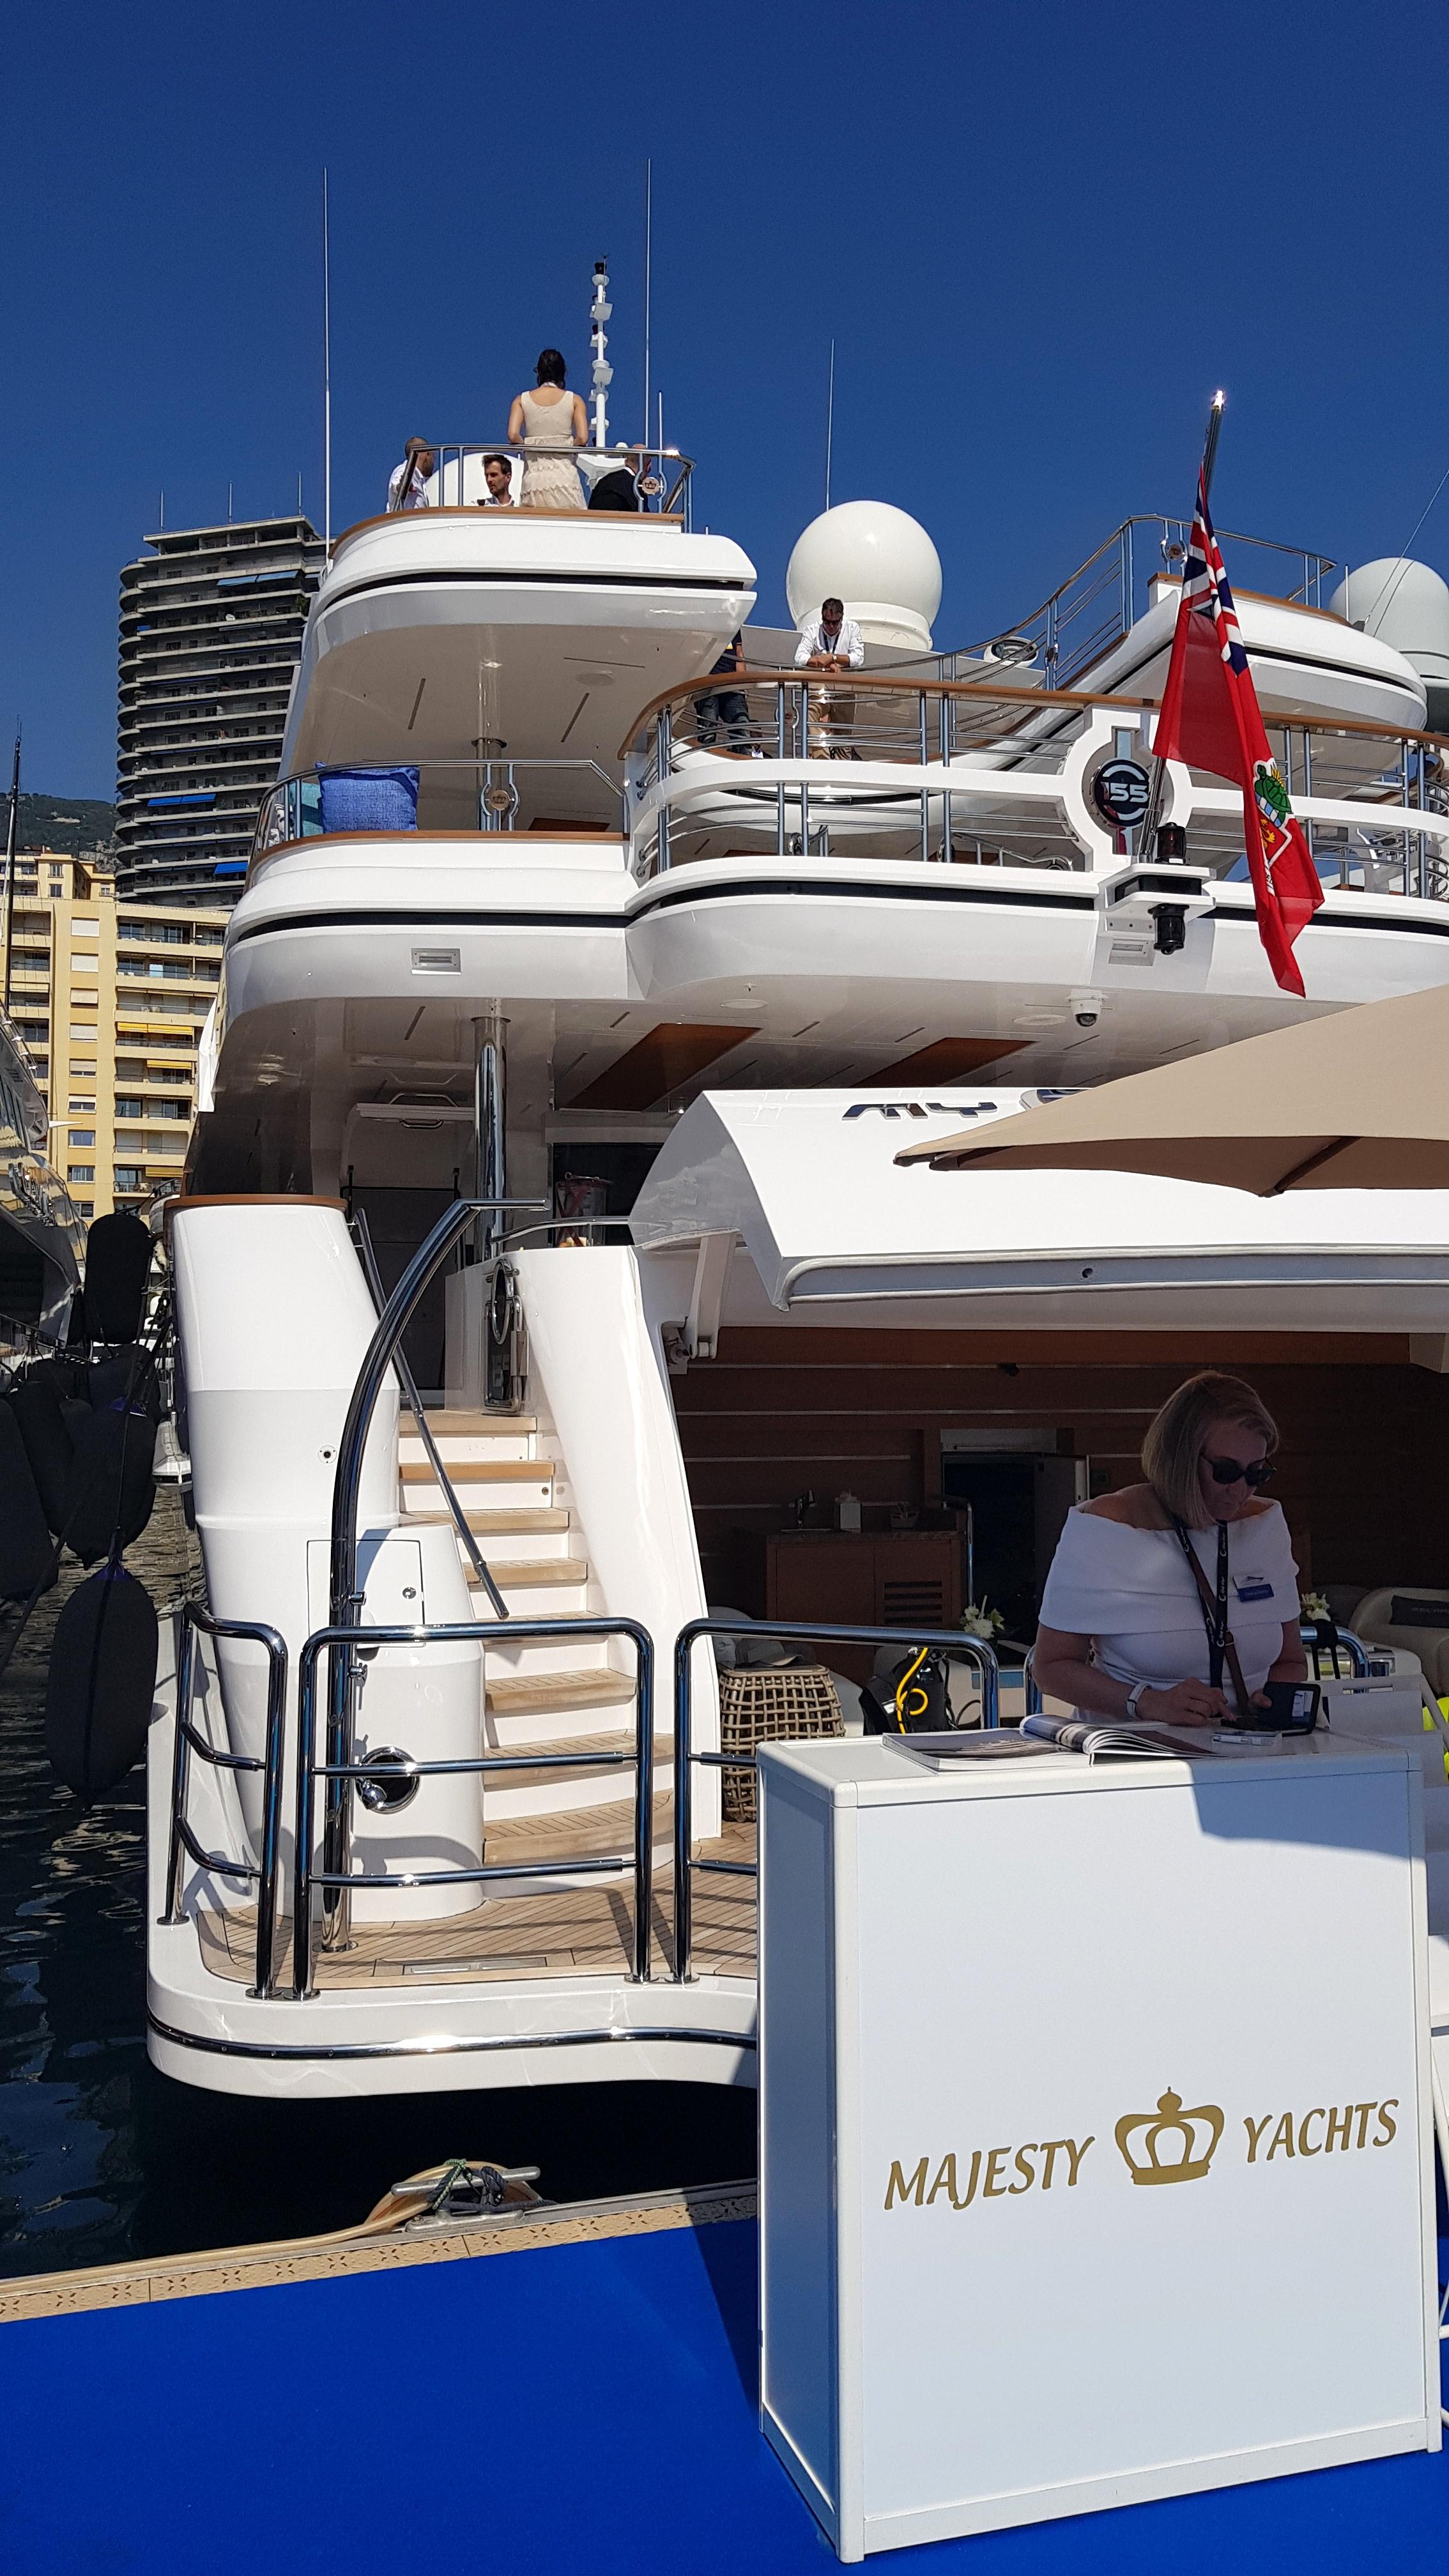 Majesty-155-at-the-Monaco-Yacht-Show-2017.jpg